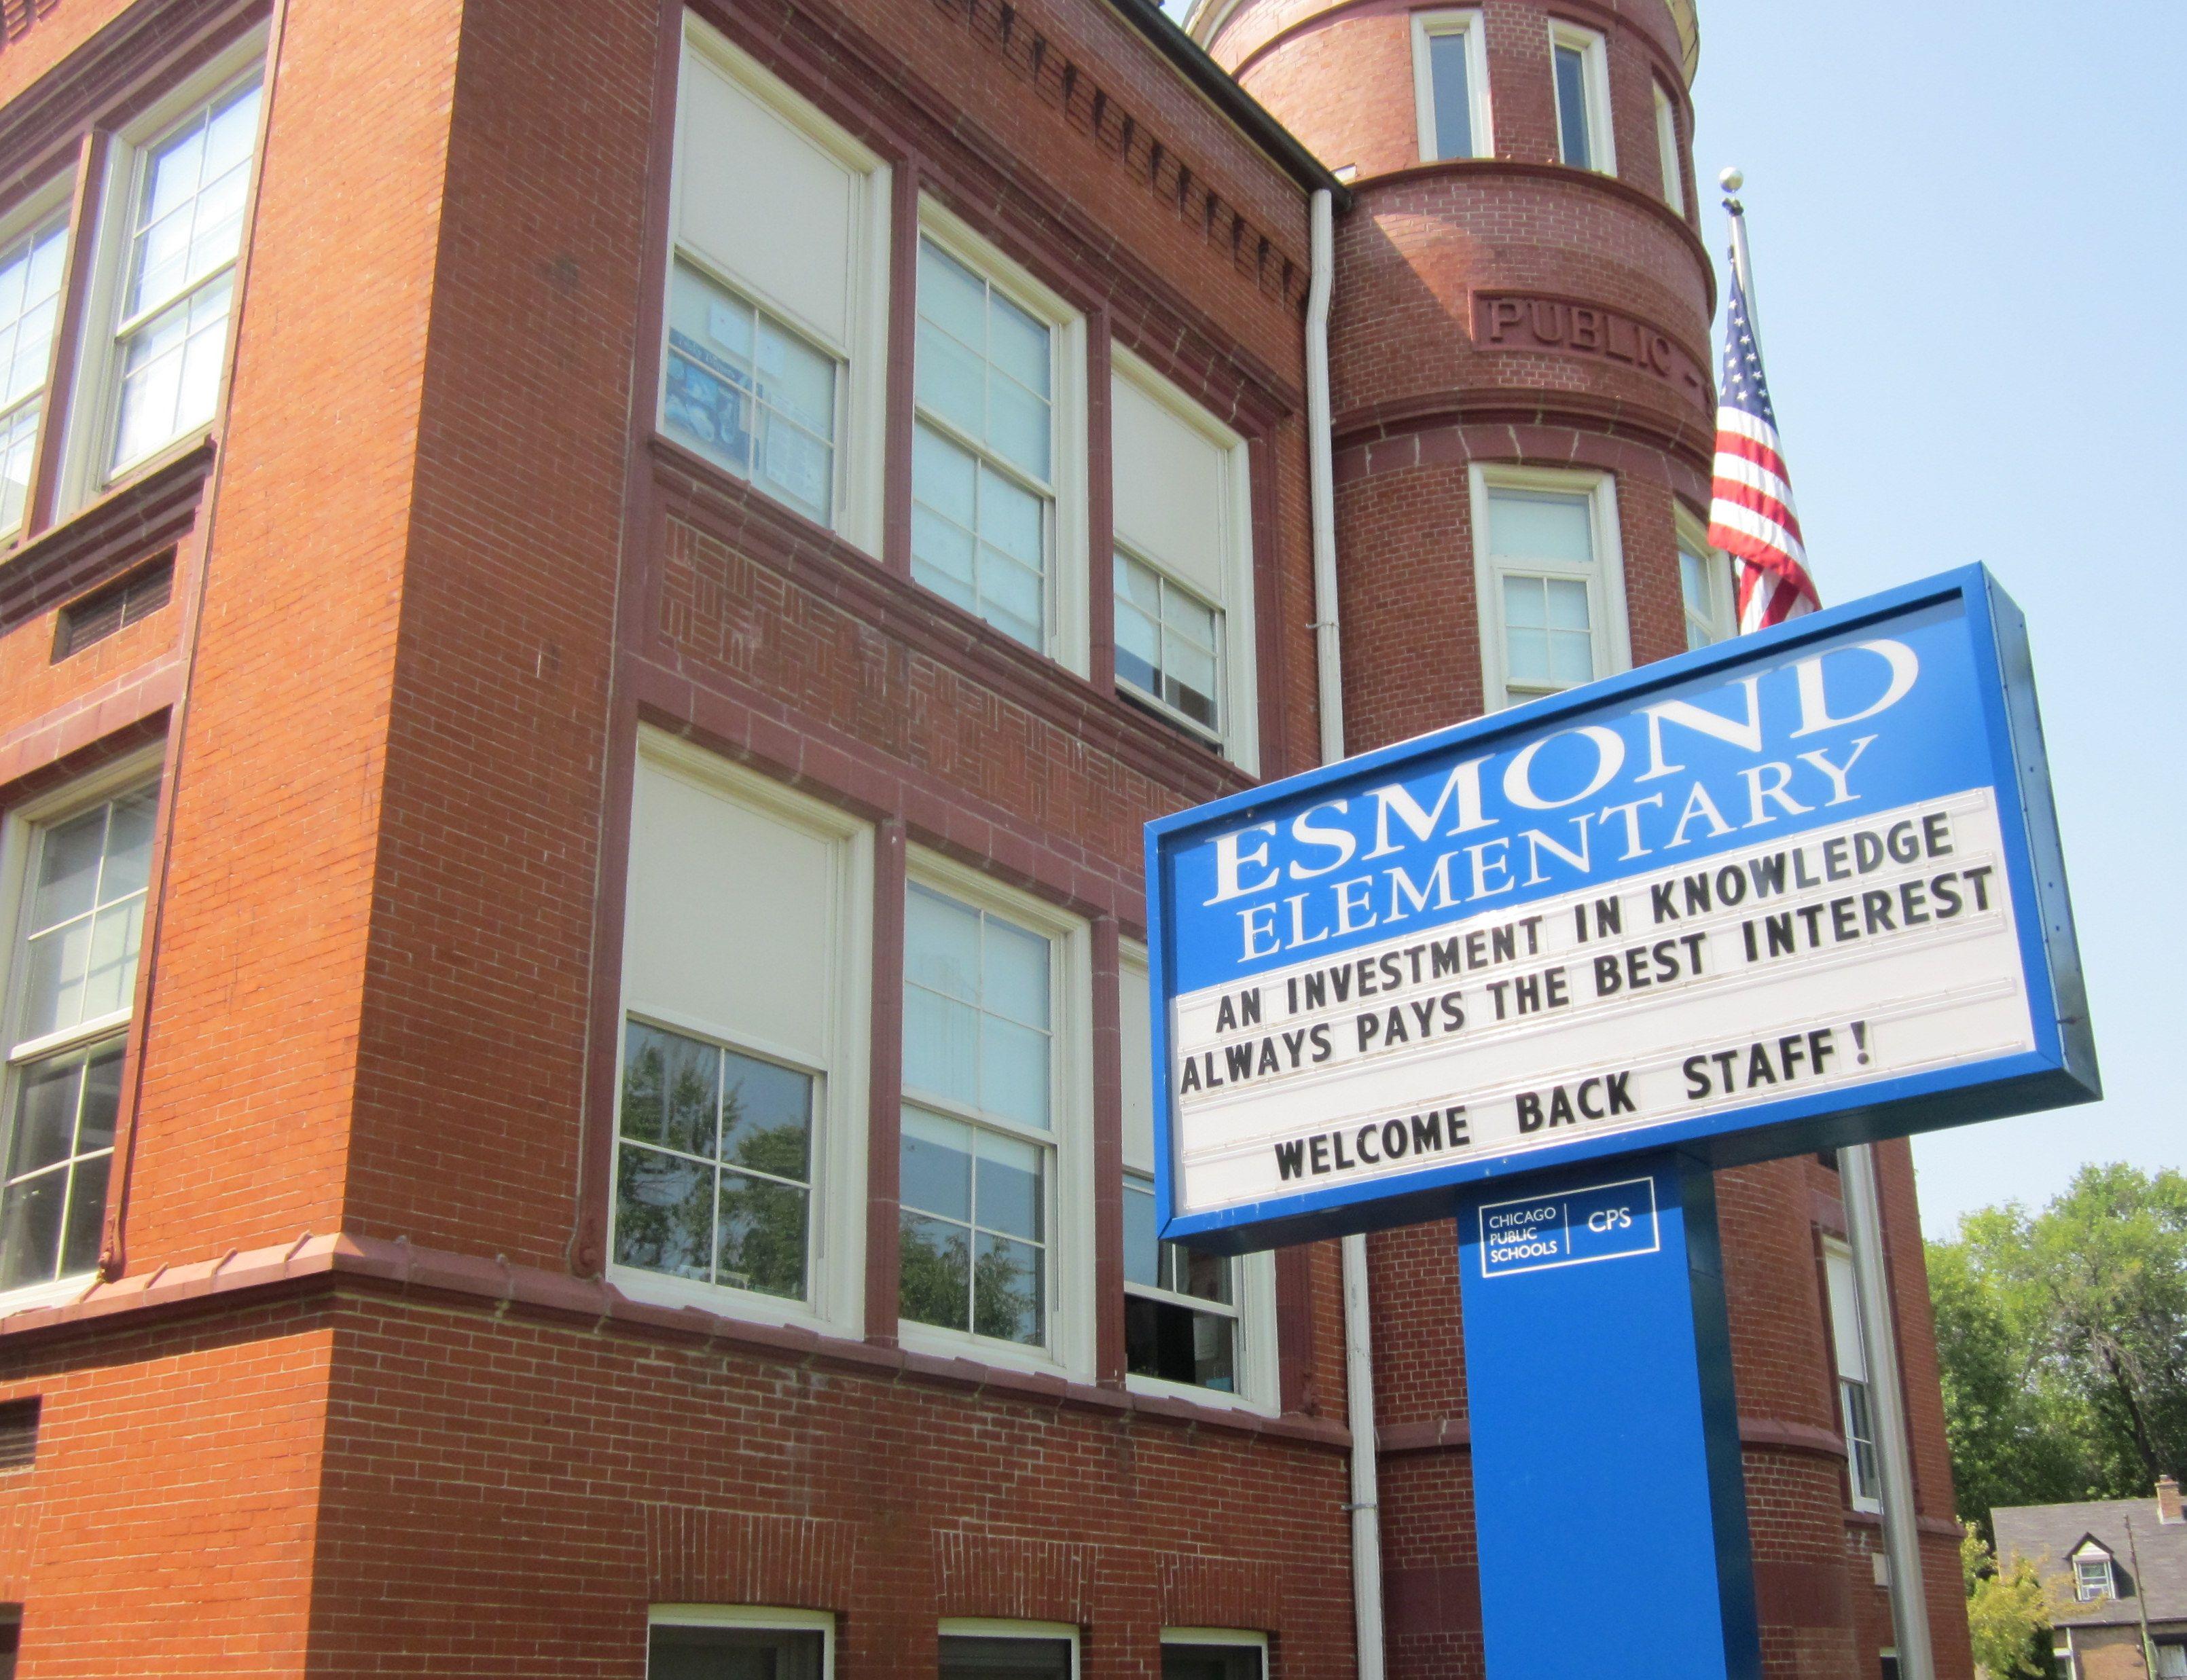 featured image Esmond Elementary School